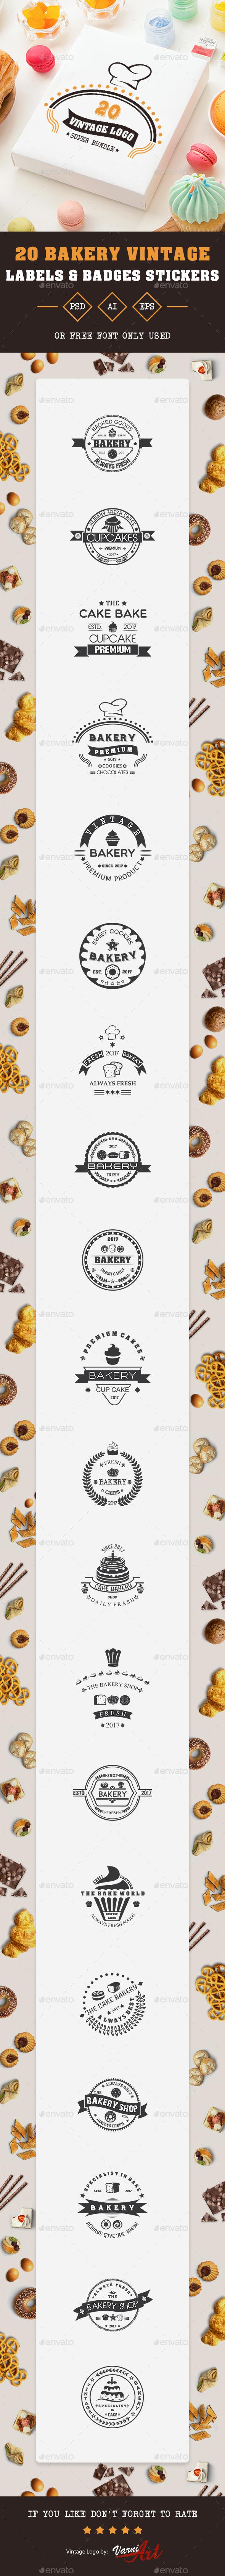 GraphicRiver 20 Bakery Vintage Labels 20685387